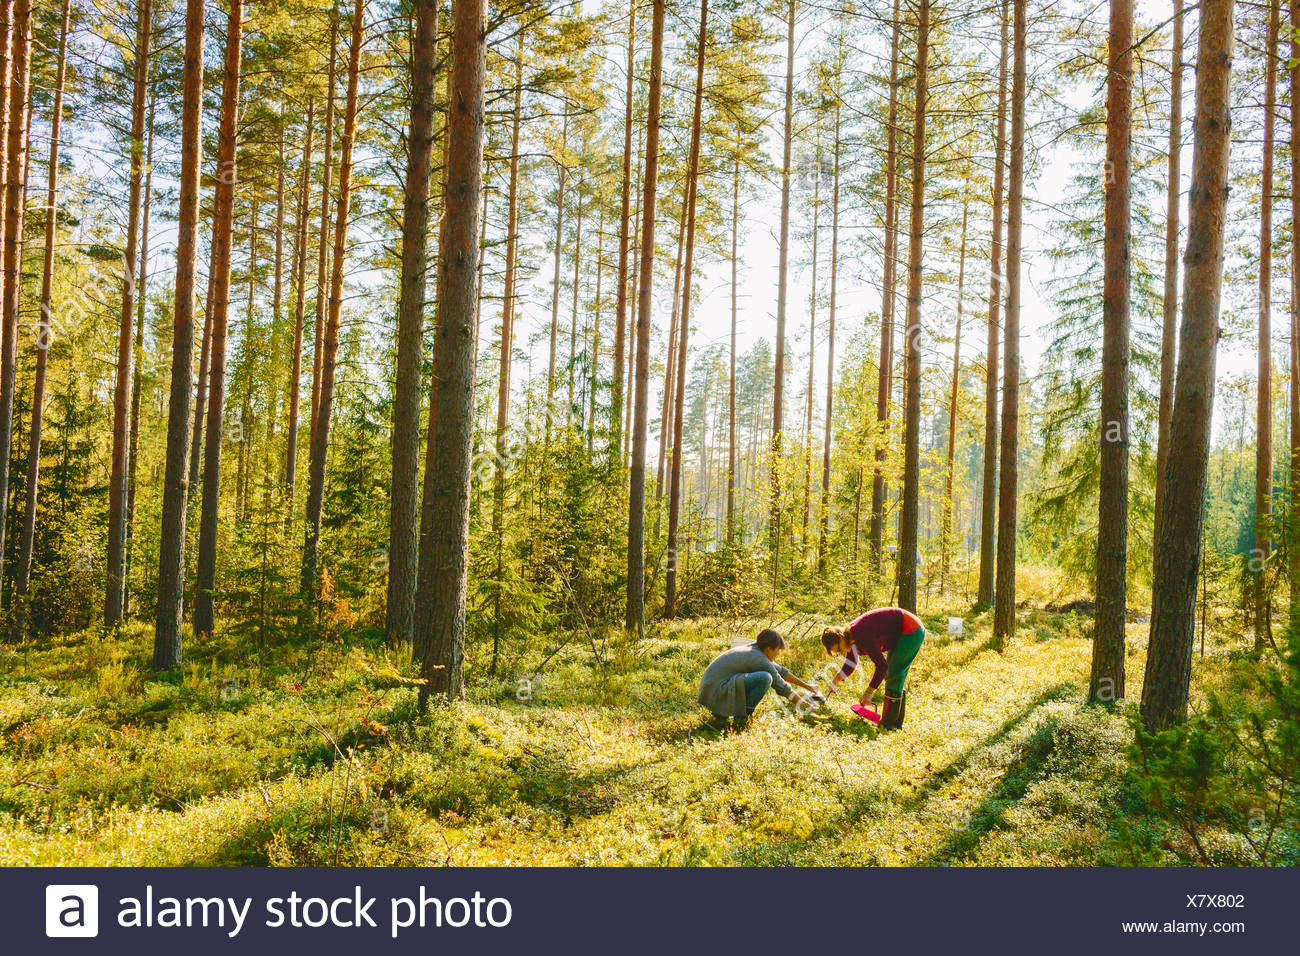 Finnland, Etela-Savo, Huttula, zwei Frauen, die Pilze im Wald Stockbild